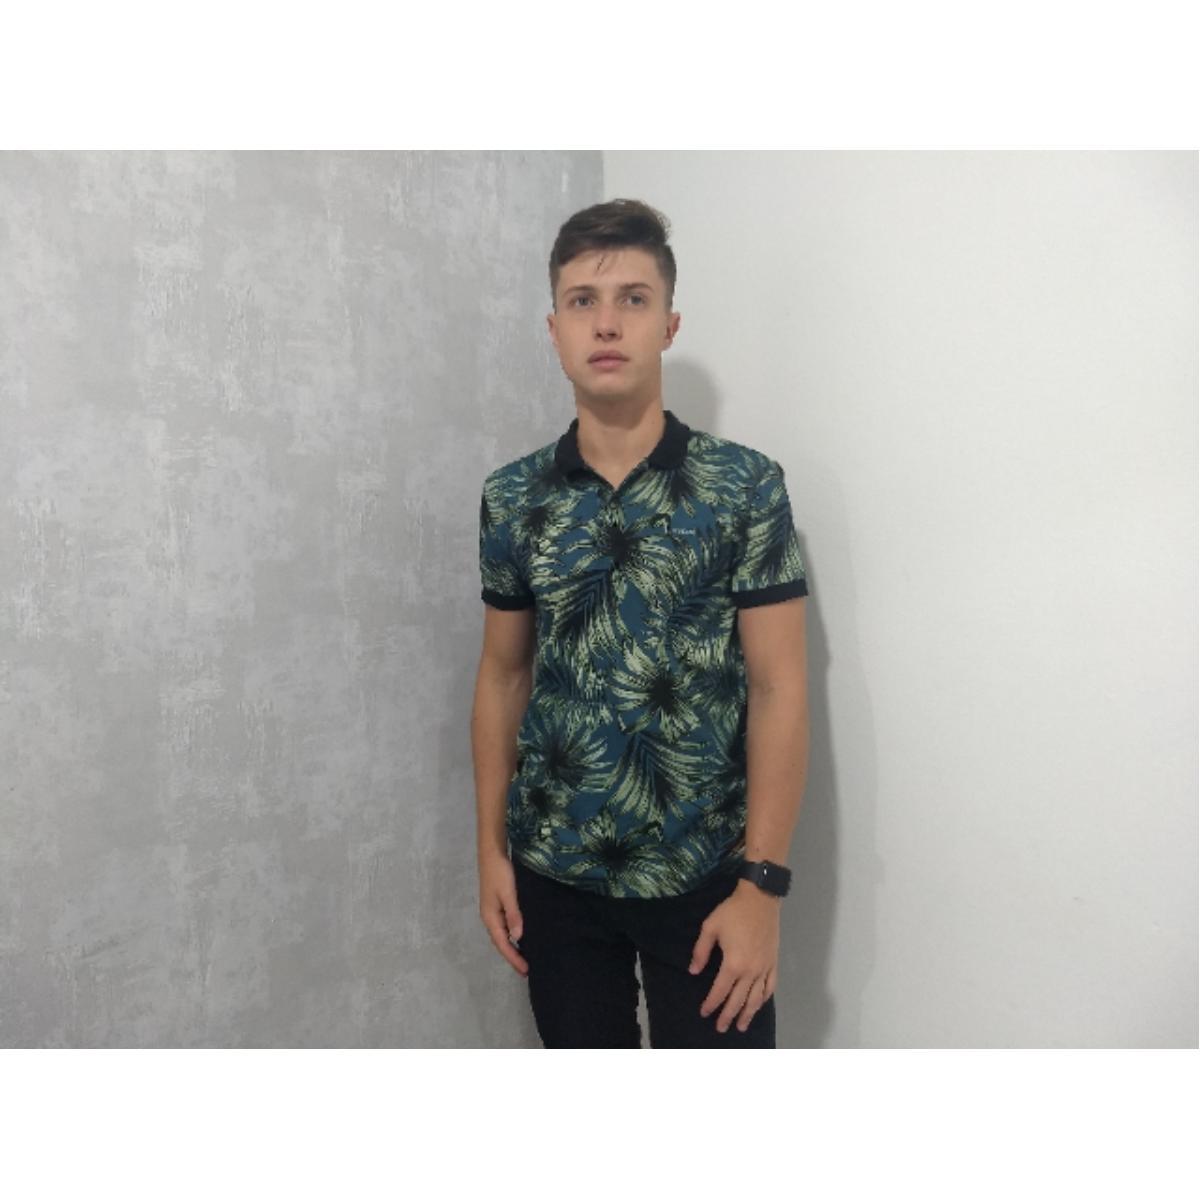 Camiseta Masculina Colcci 250102460 Vc80 Preto Estampado